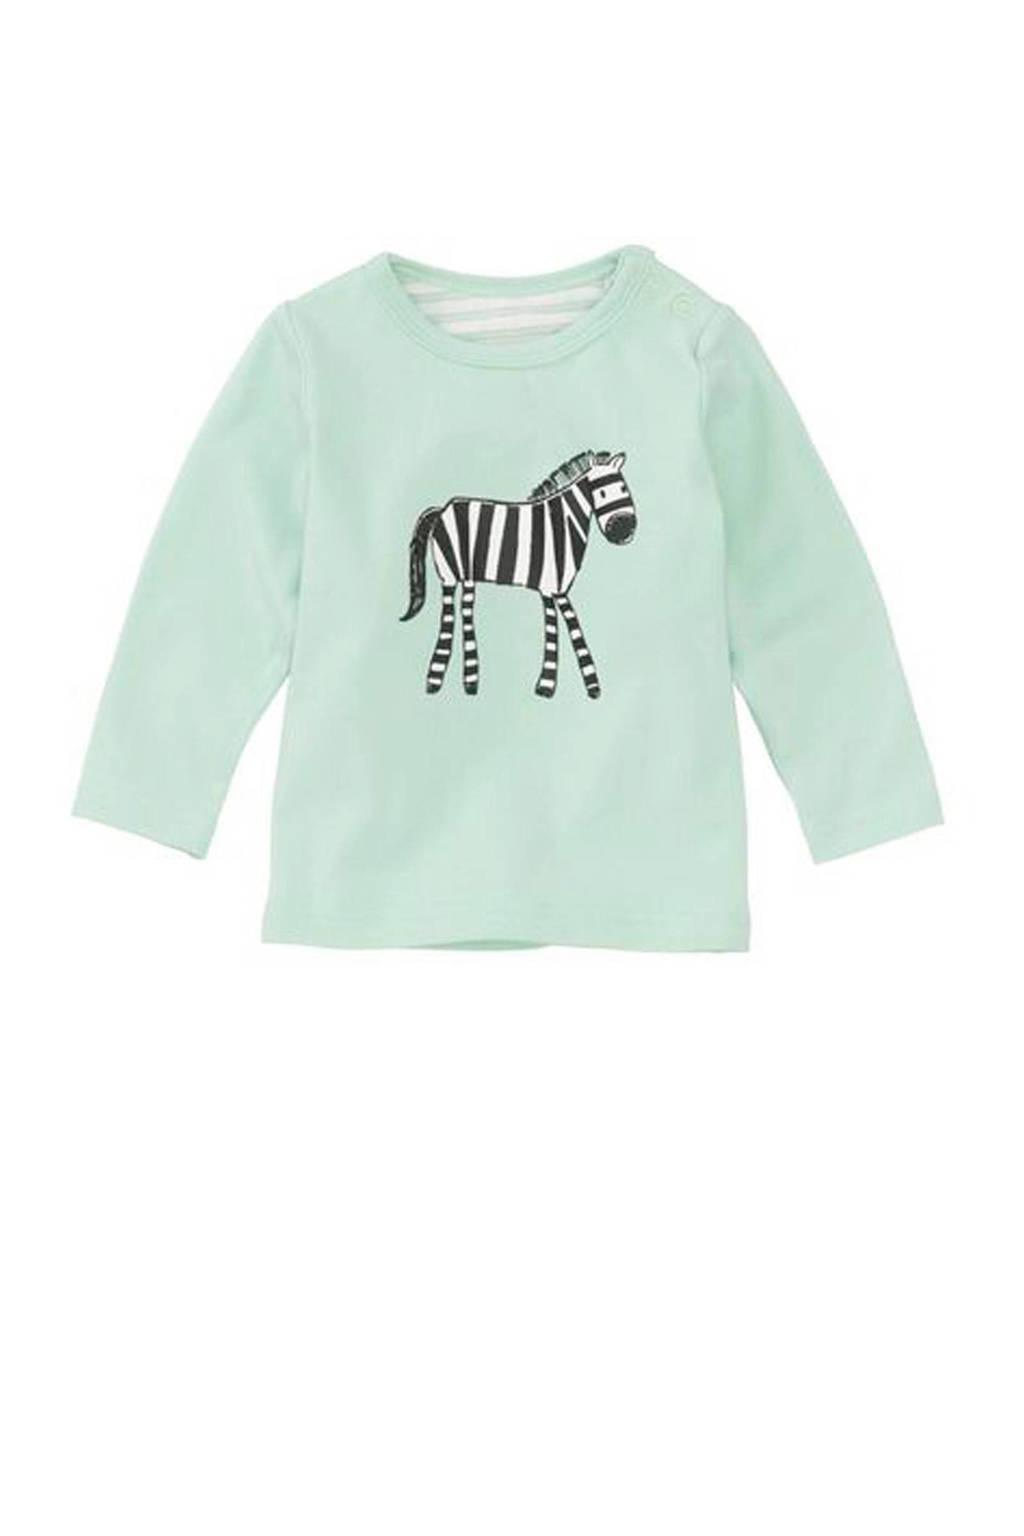 HEMA newborn baby t-shirt met zebra mintgroen, Mintgroen